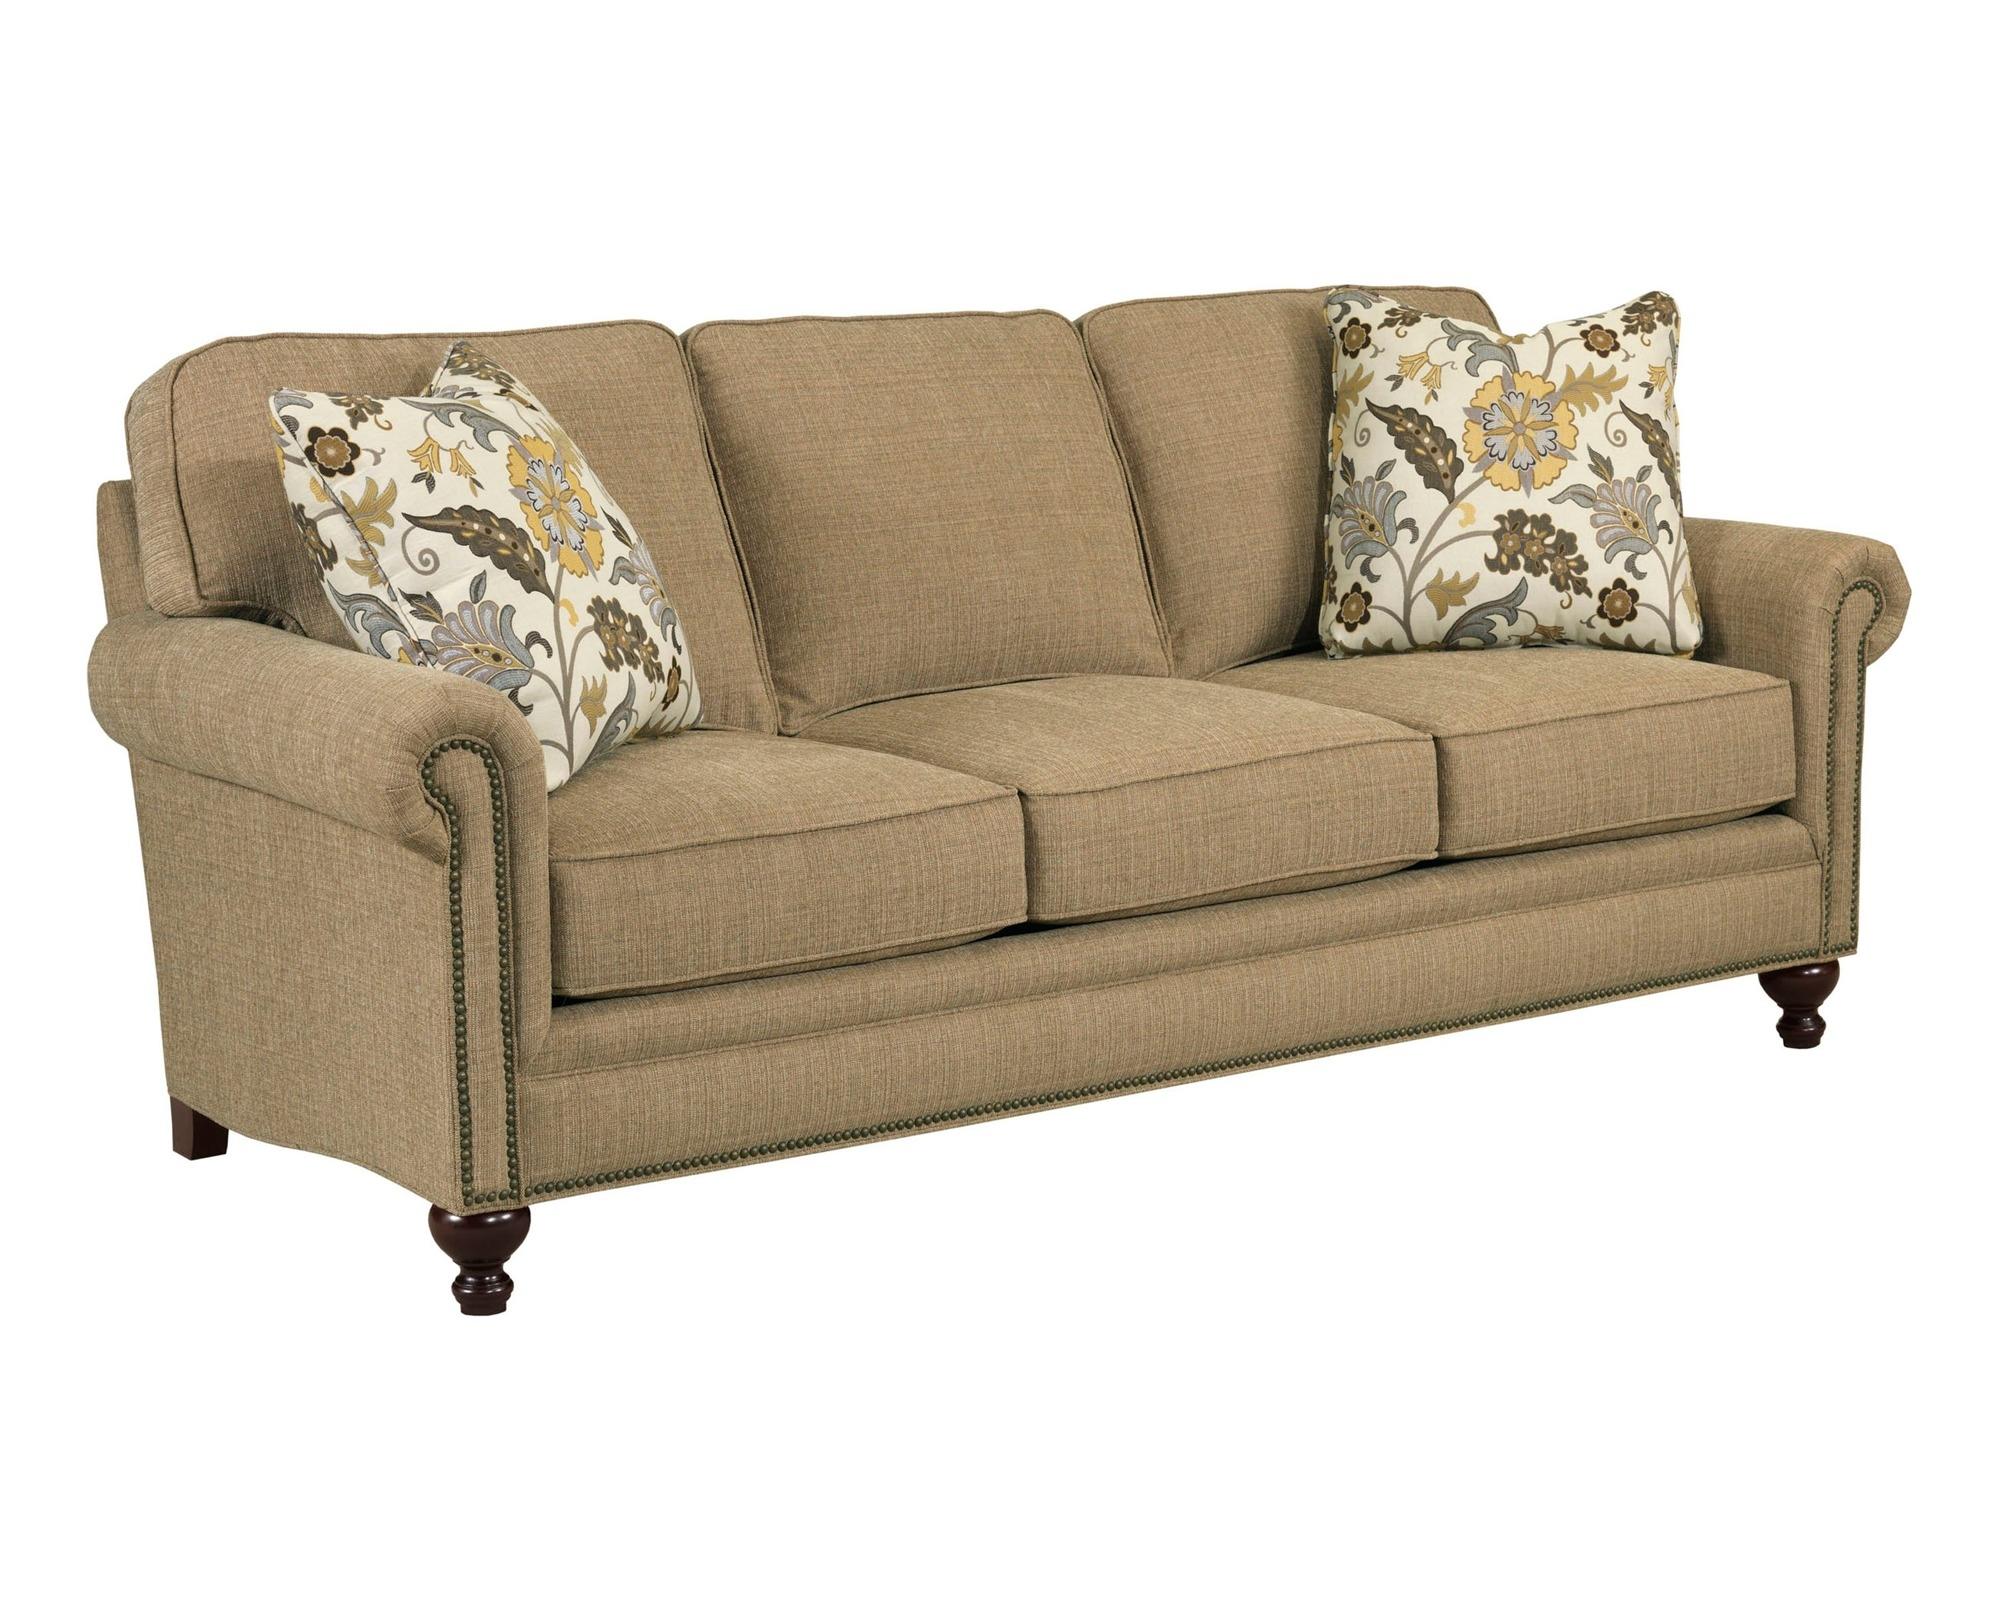 Sofas Center : Broyhill Sectional Sofa Sofas With Recliners Pertaining To Broyhill Sectional Sofa (View 12 of 15)